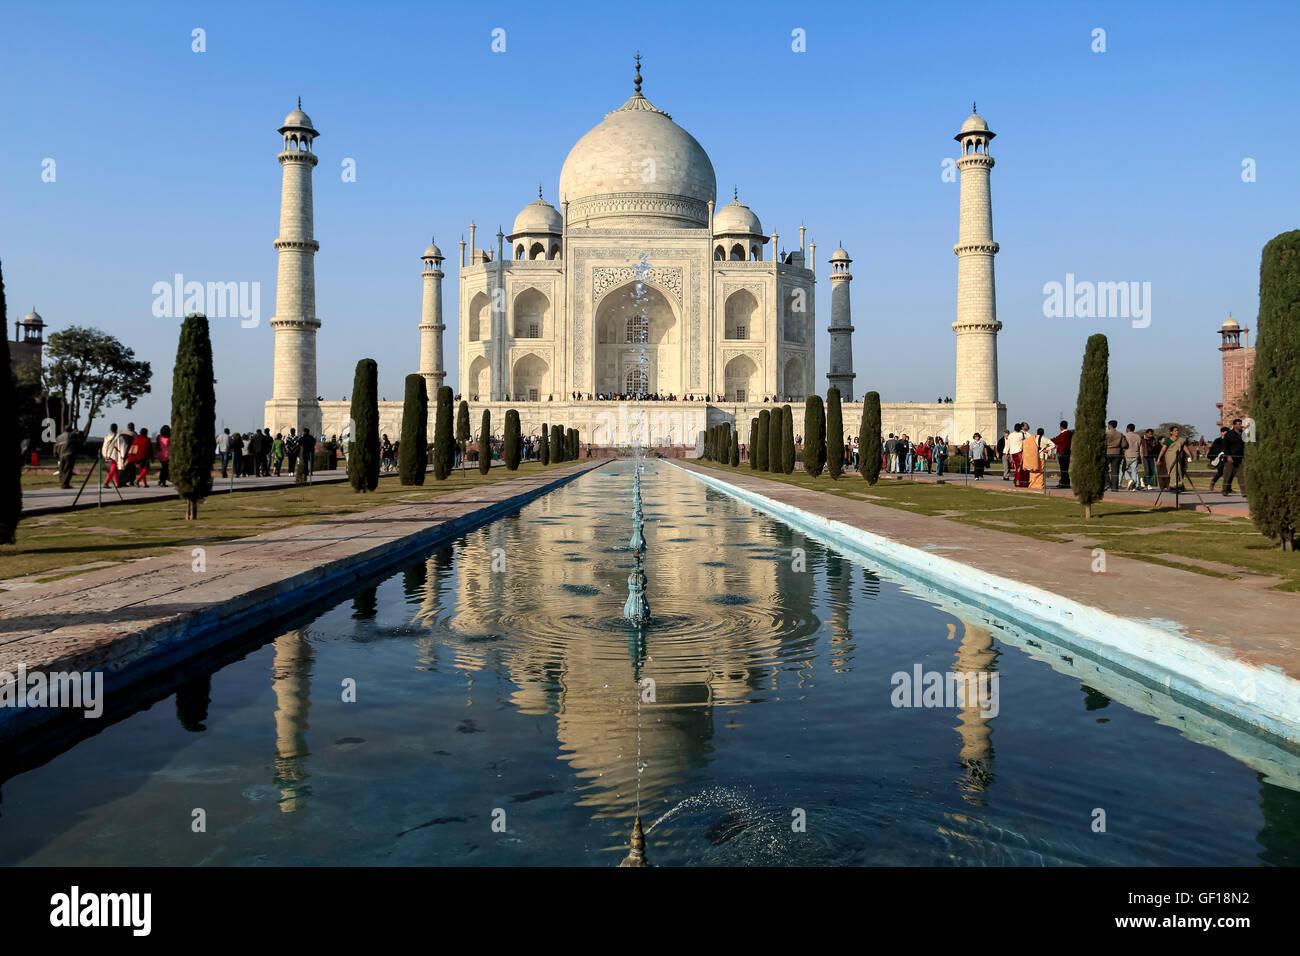 Taj Mahal, India - January 2013. View of the Taj Mahal and the reflecting pool. - Stock Image